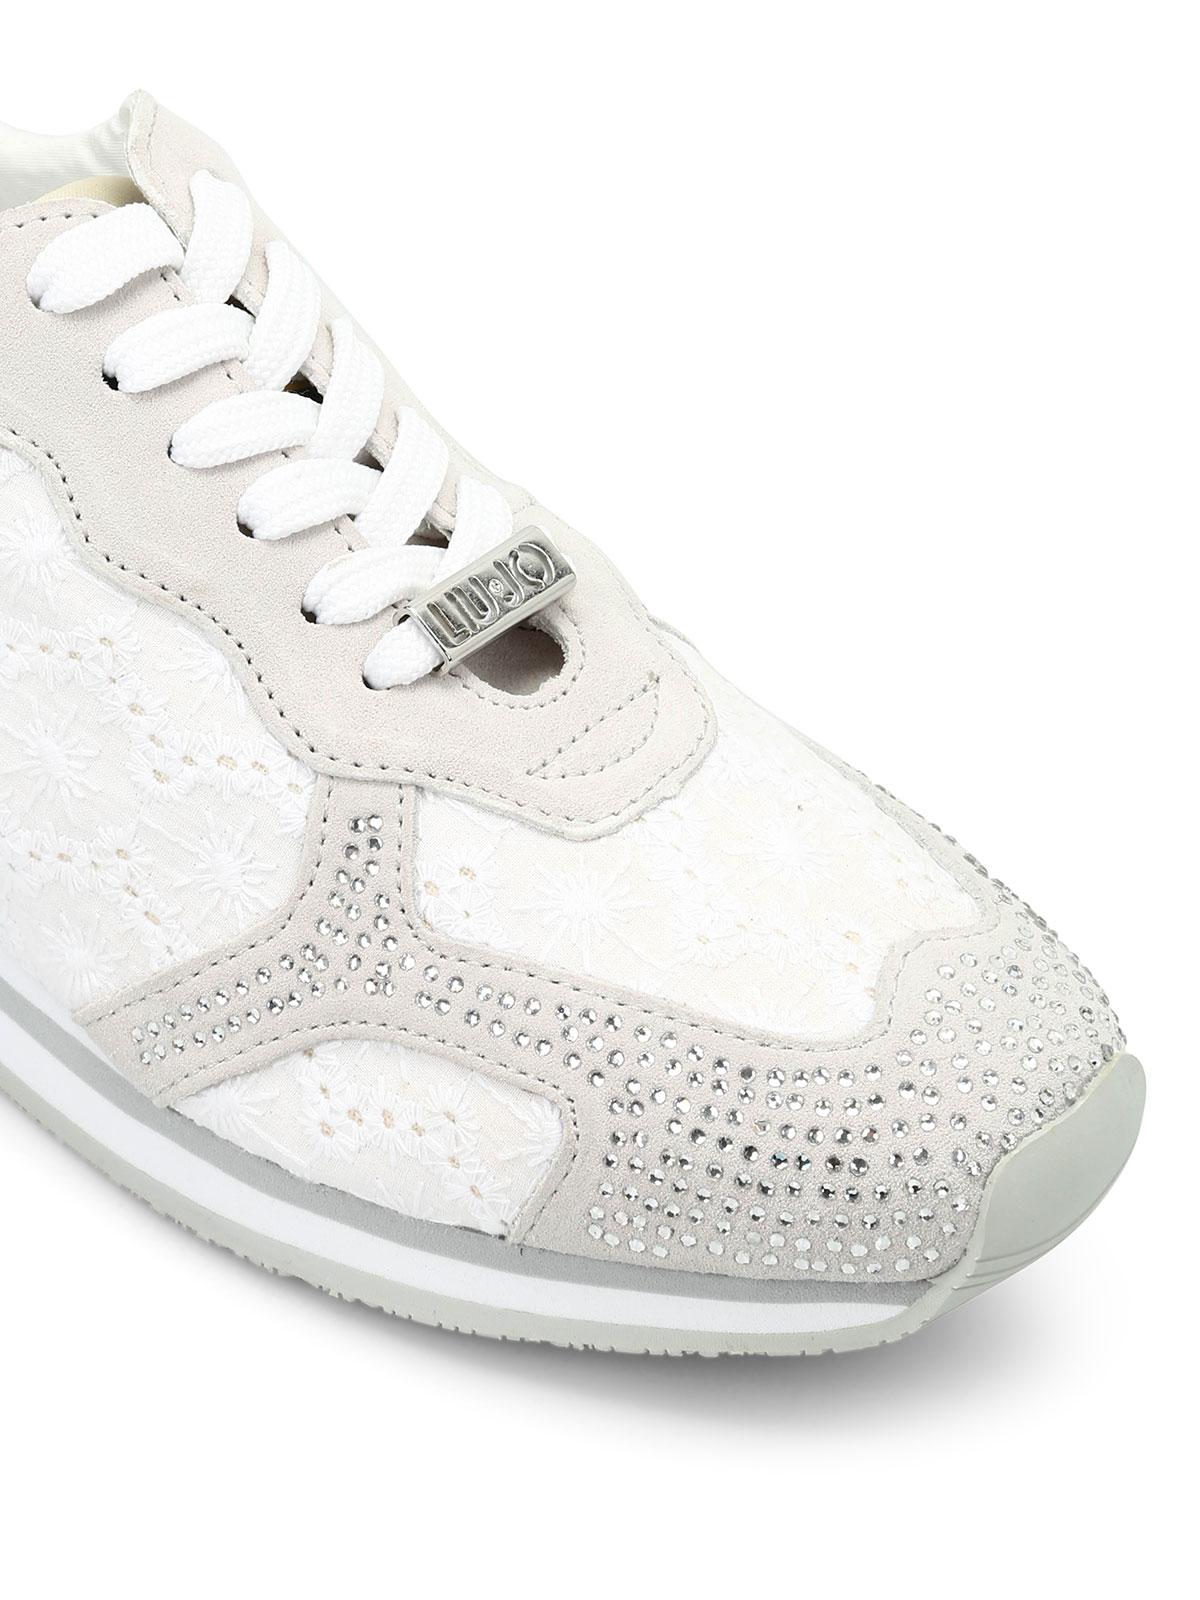 Running 10601 Jo Sneakers S16115 T0257 Scarpe Malice Liu dtsQxhrC